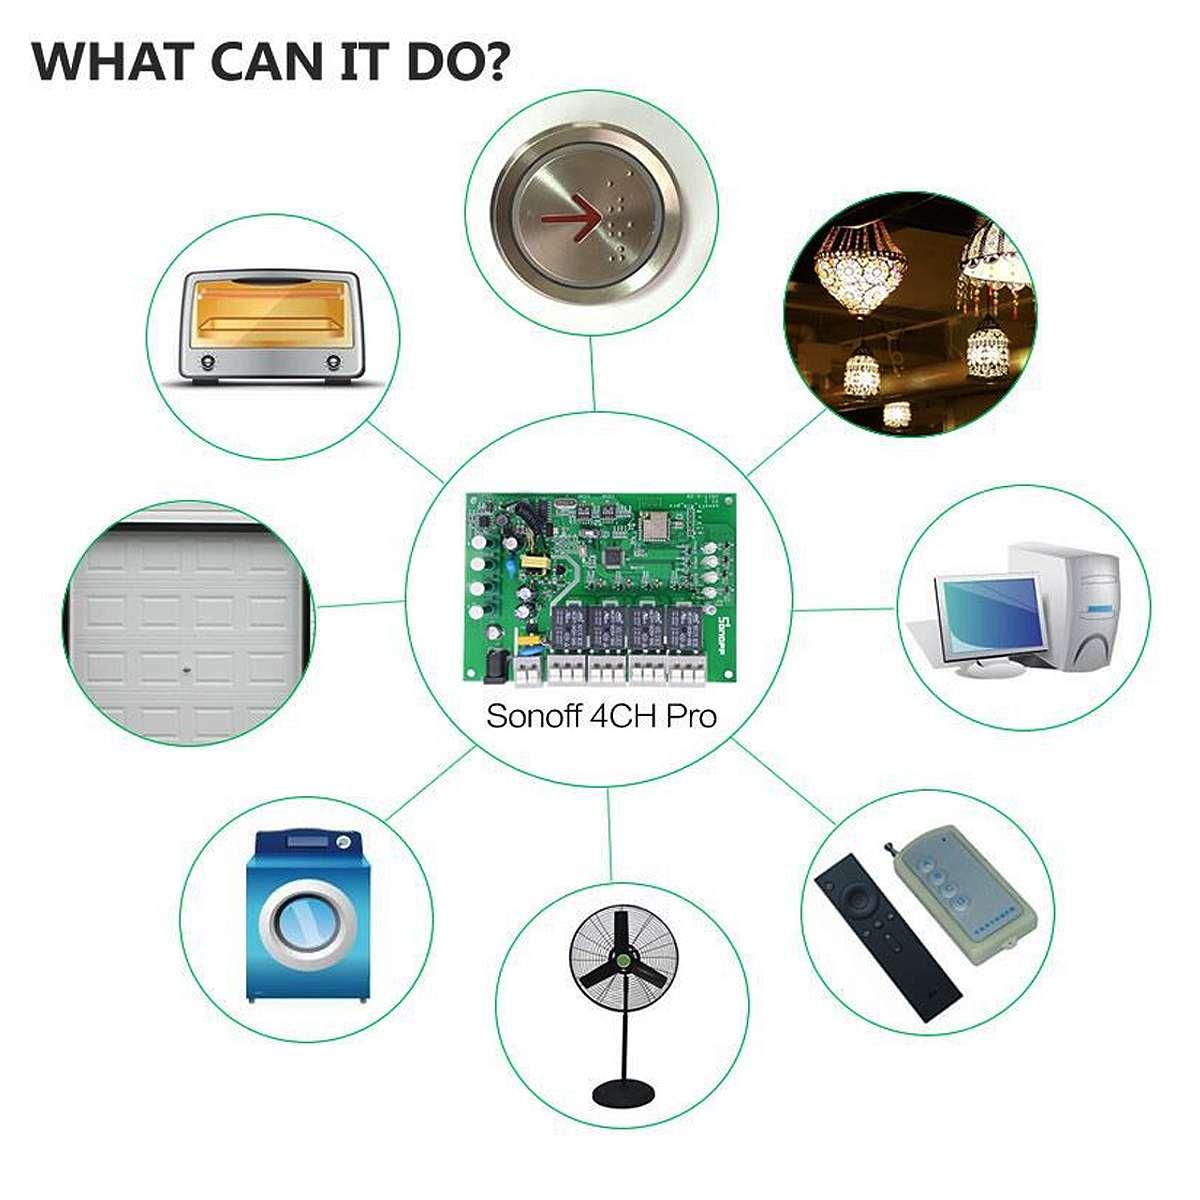 SONOFF 4CH Pro R2 RF Smart Home Module 2.4Ghz 433MHz WIFI Wireless Switch APP Remote Control Inching/Self-Locking/Interlock